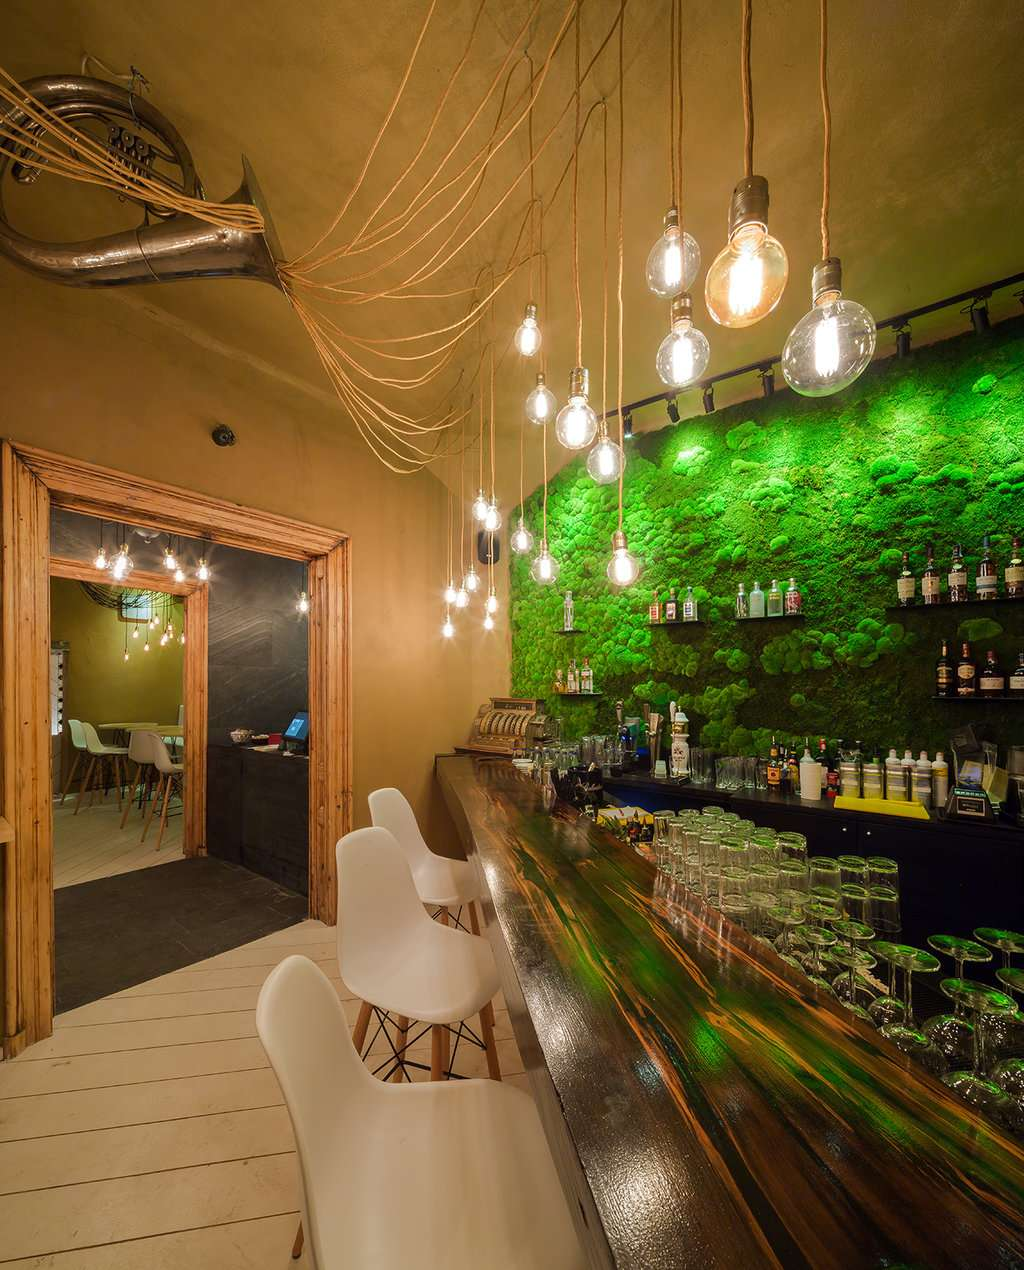 Restaurantul bucurestean Shift cu bar si perete verde